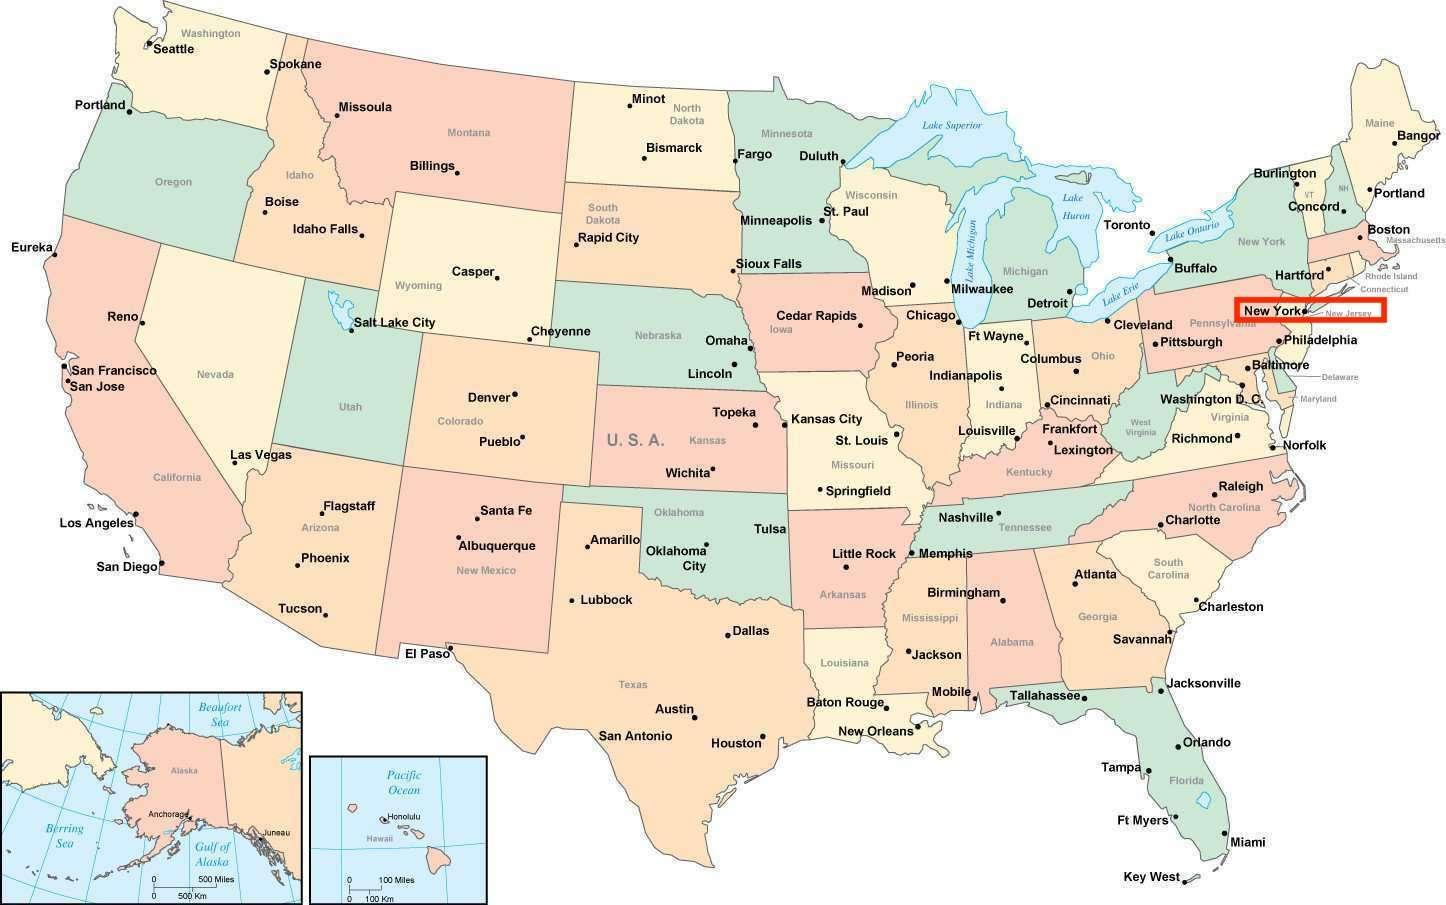 usa kart new york New York amerika kart   New York på amerikansk kart (New York   USA) usa kart new york